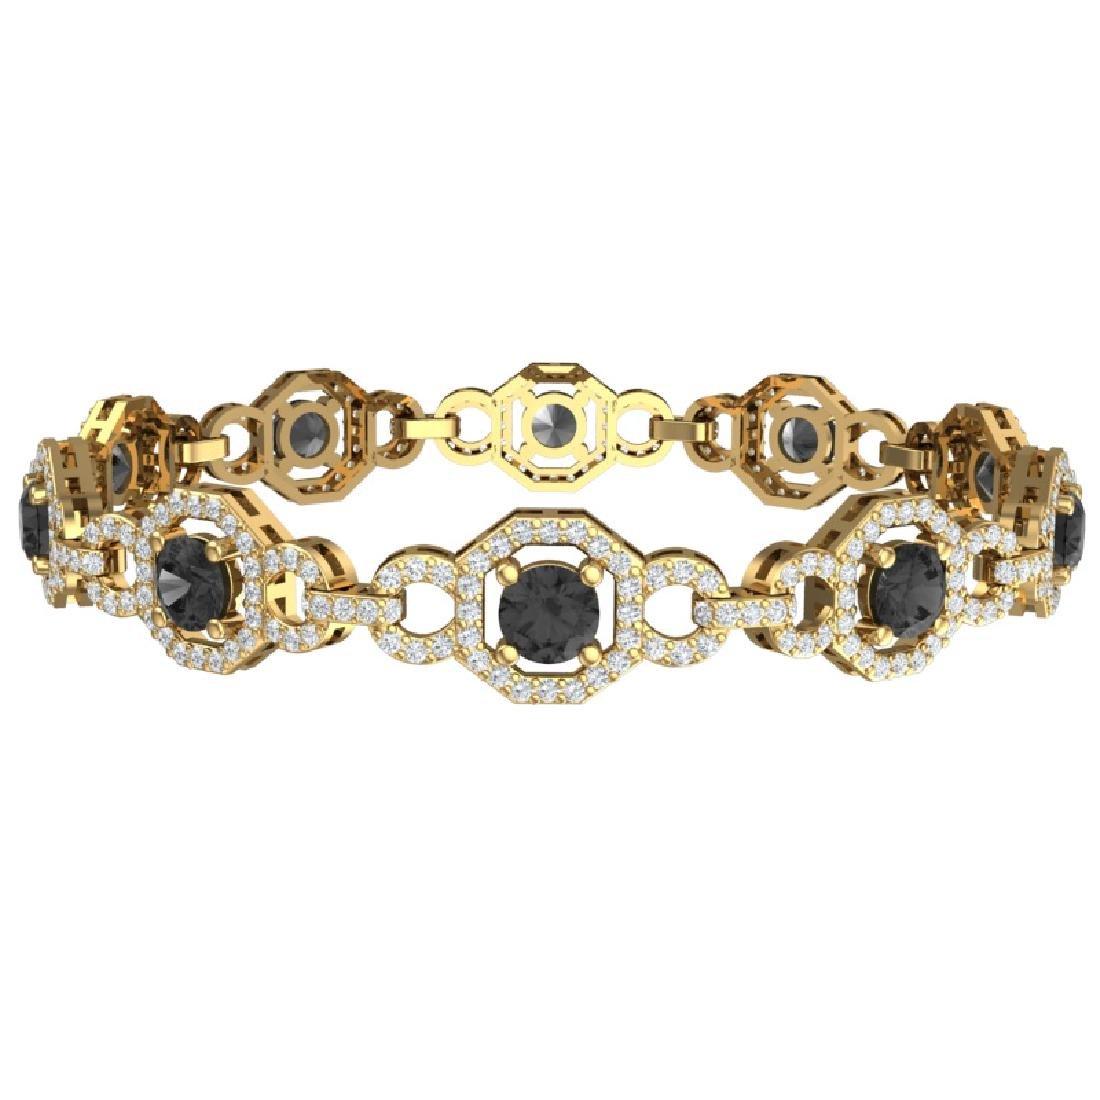 12 CTW Black And White Diamond Bracelet 18K Yellow Gold - 3